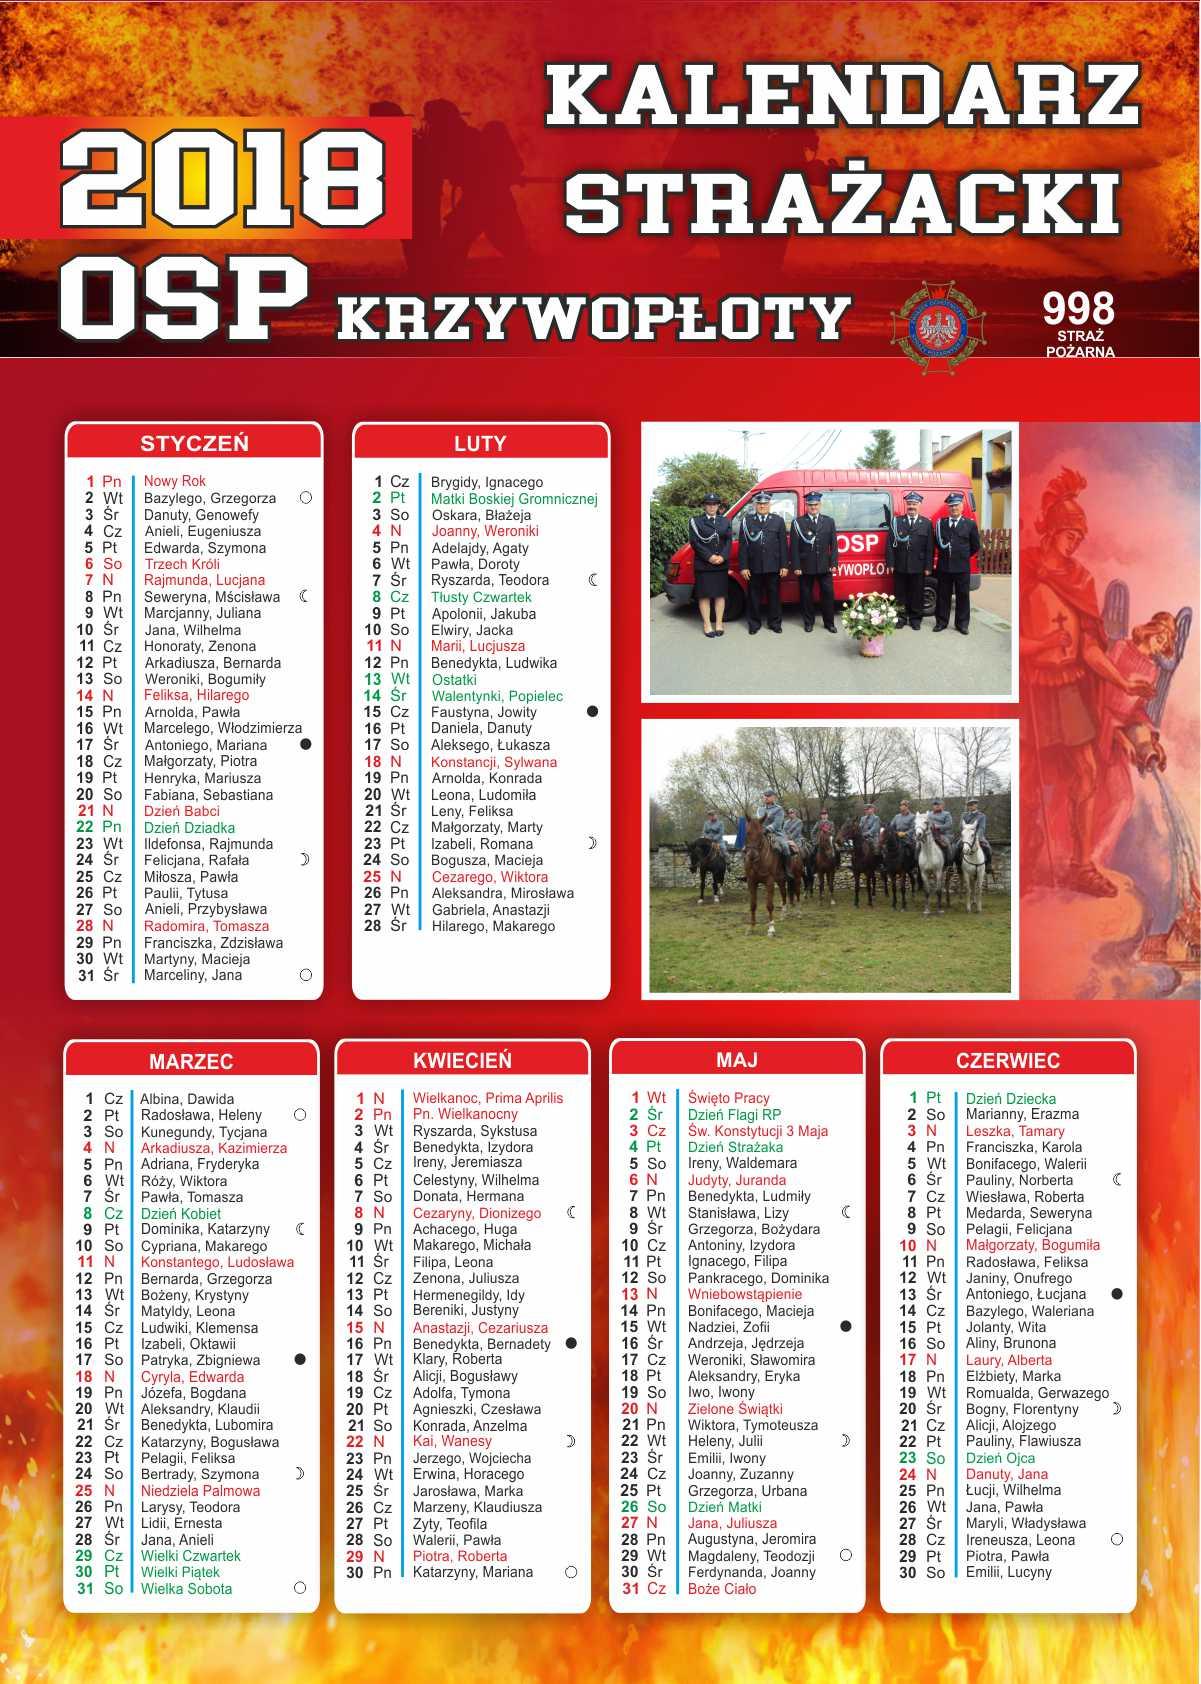 Kalendarze strażackie Olkusz